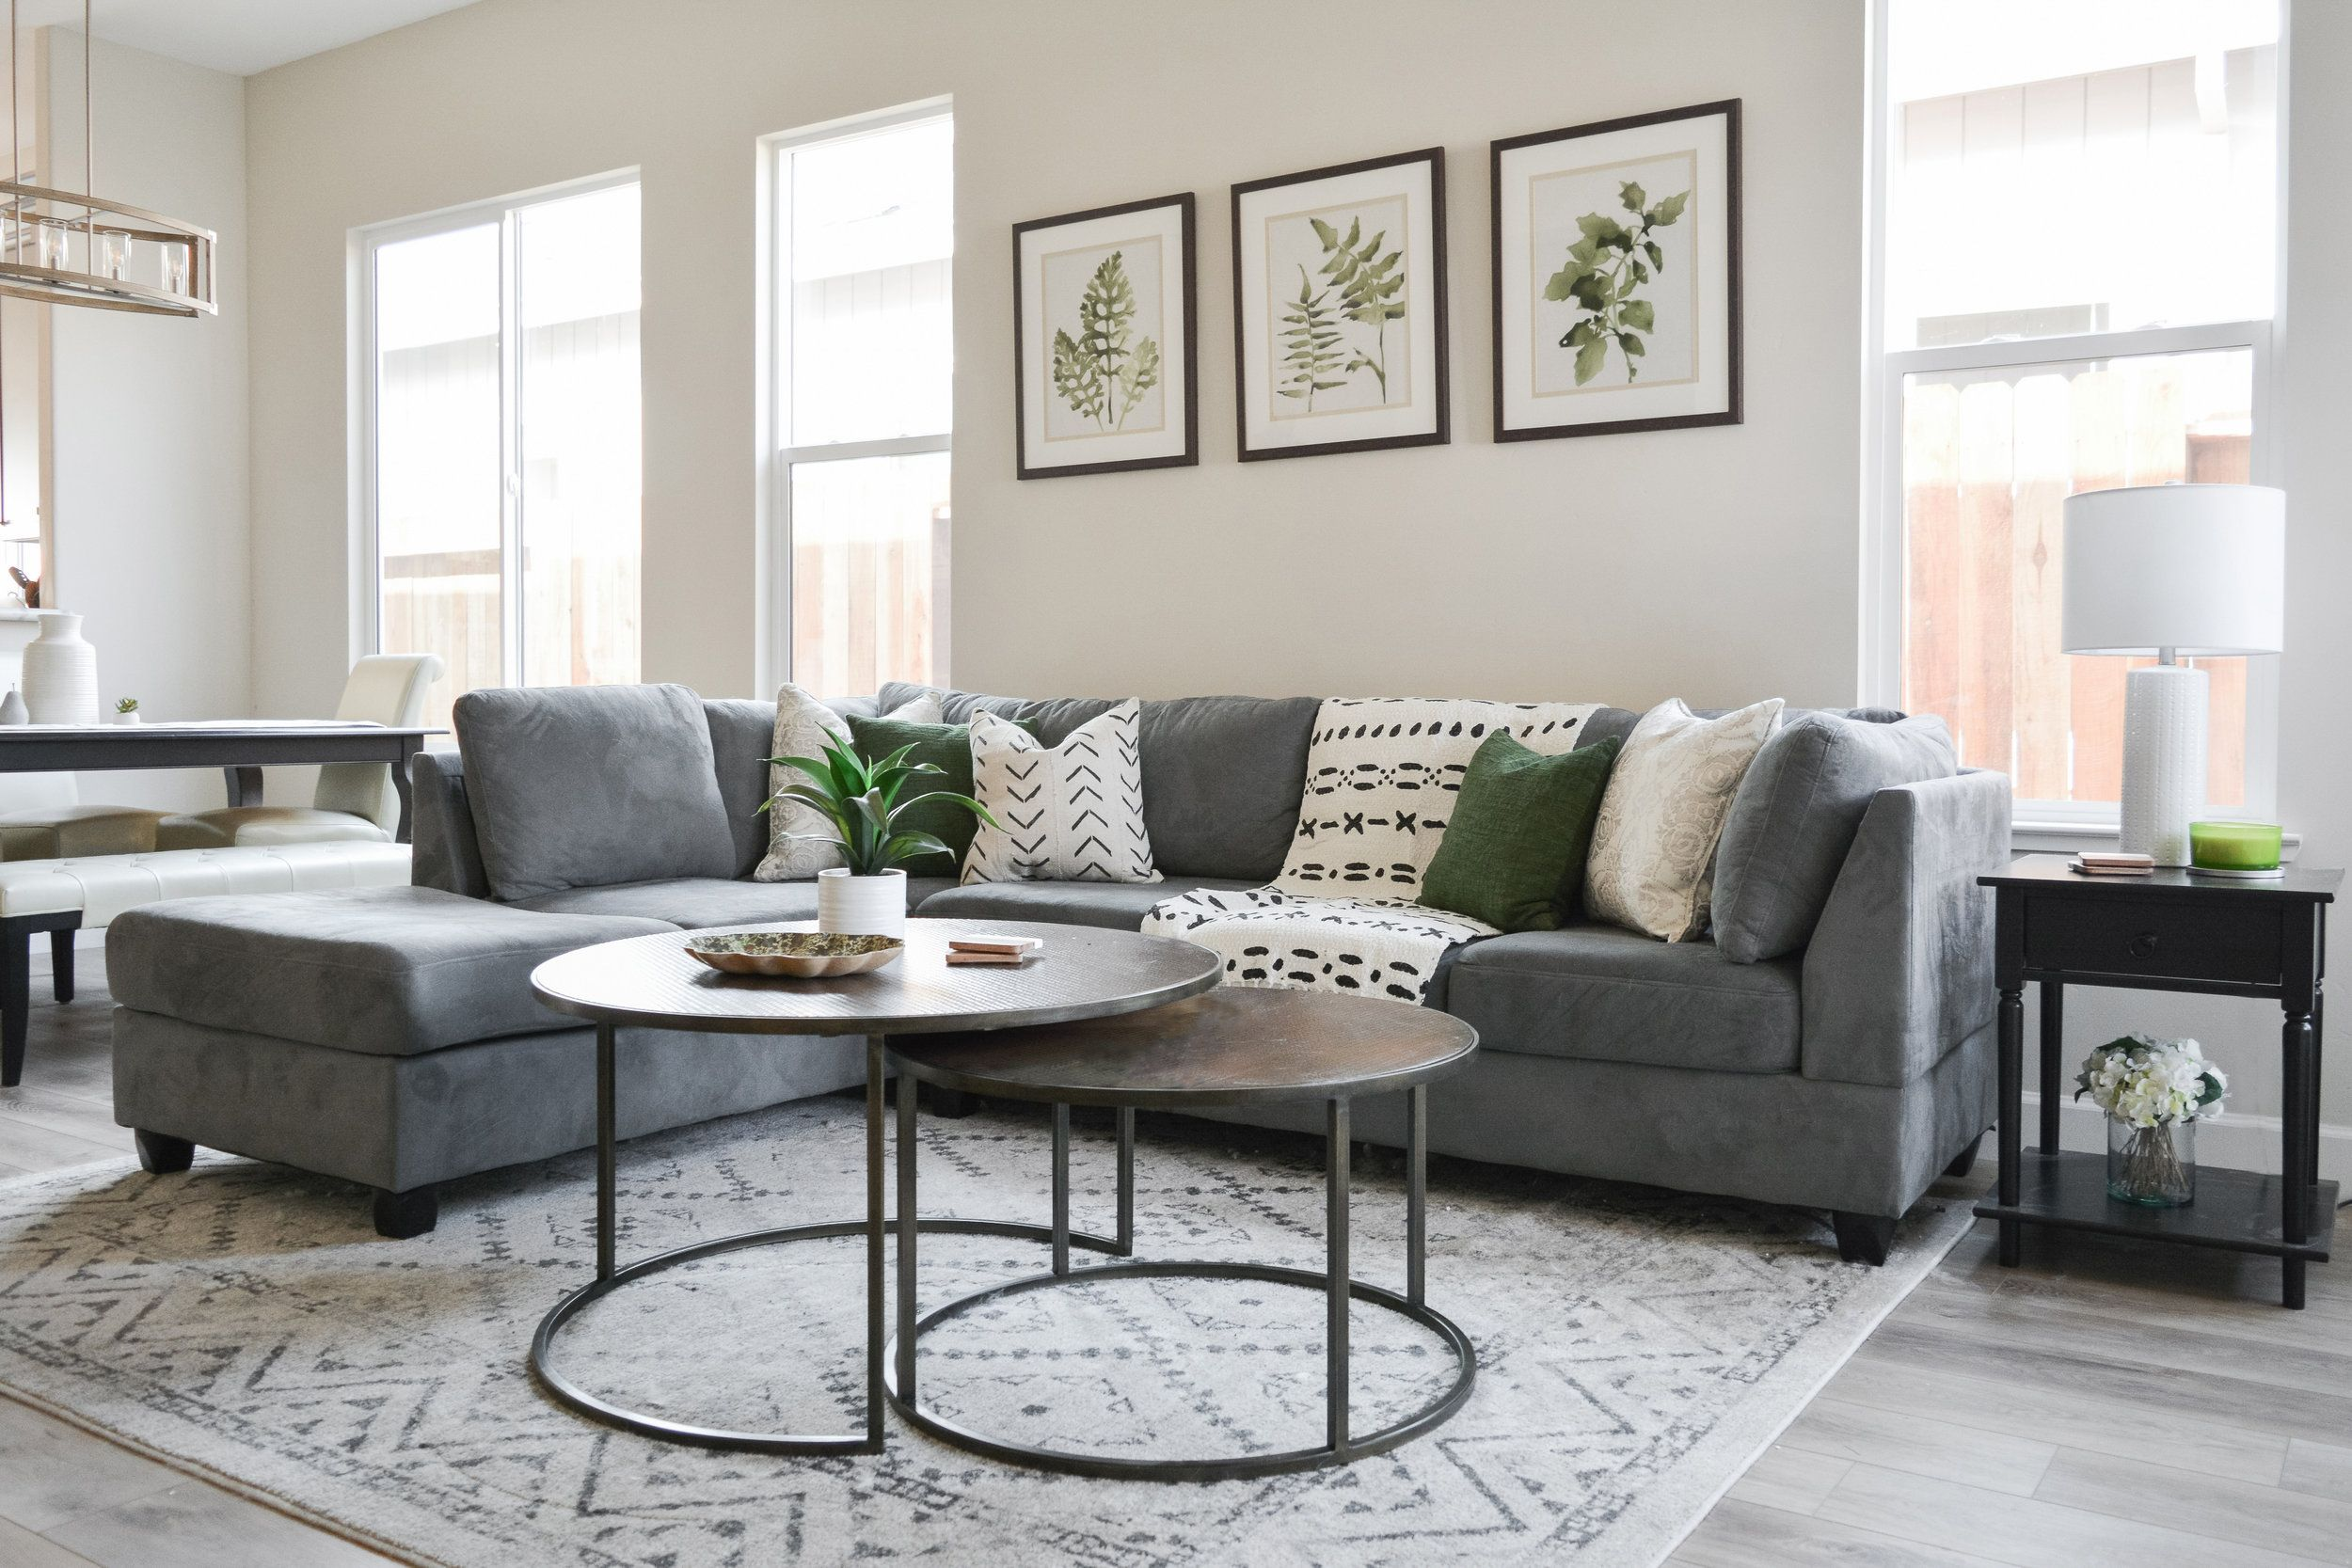 Angela Grace Design Willowgreen Living Dining San Francisco And Sf Bay Area Interior Designer Decorator